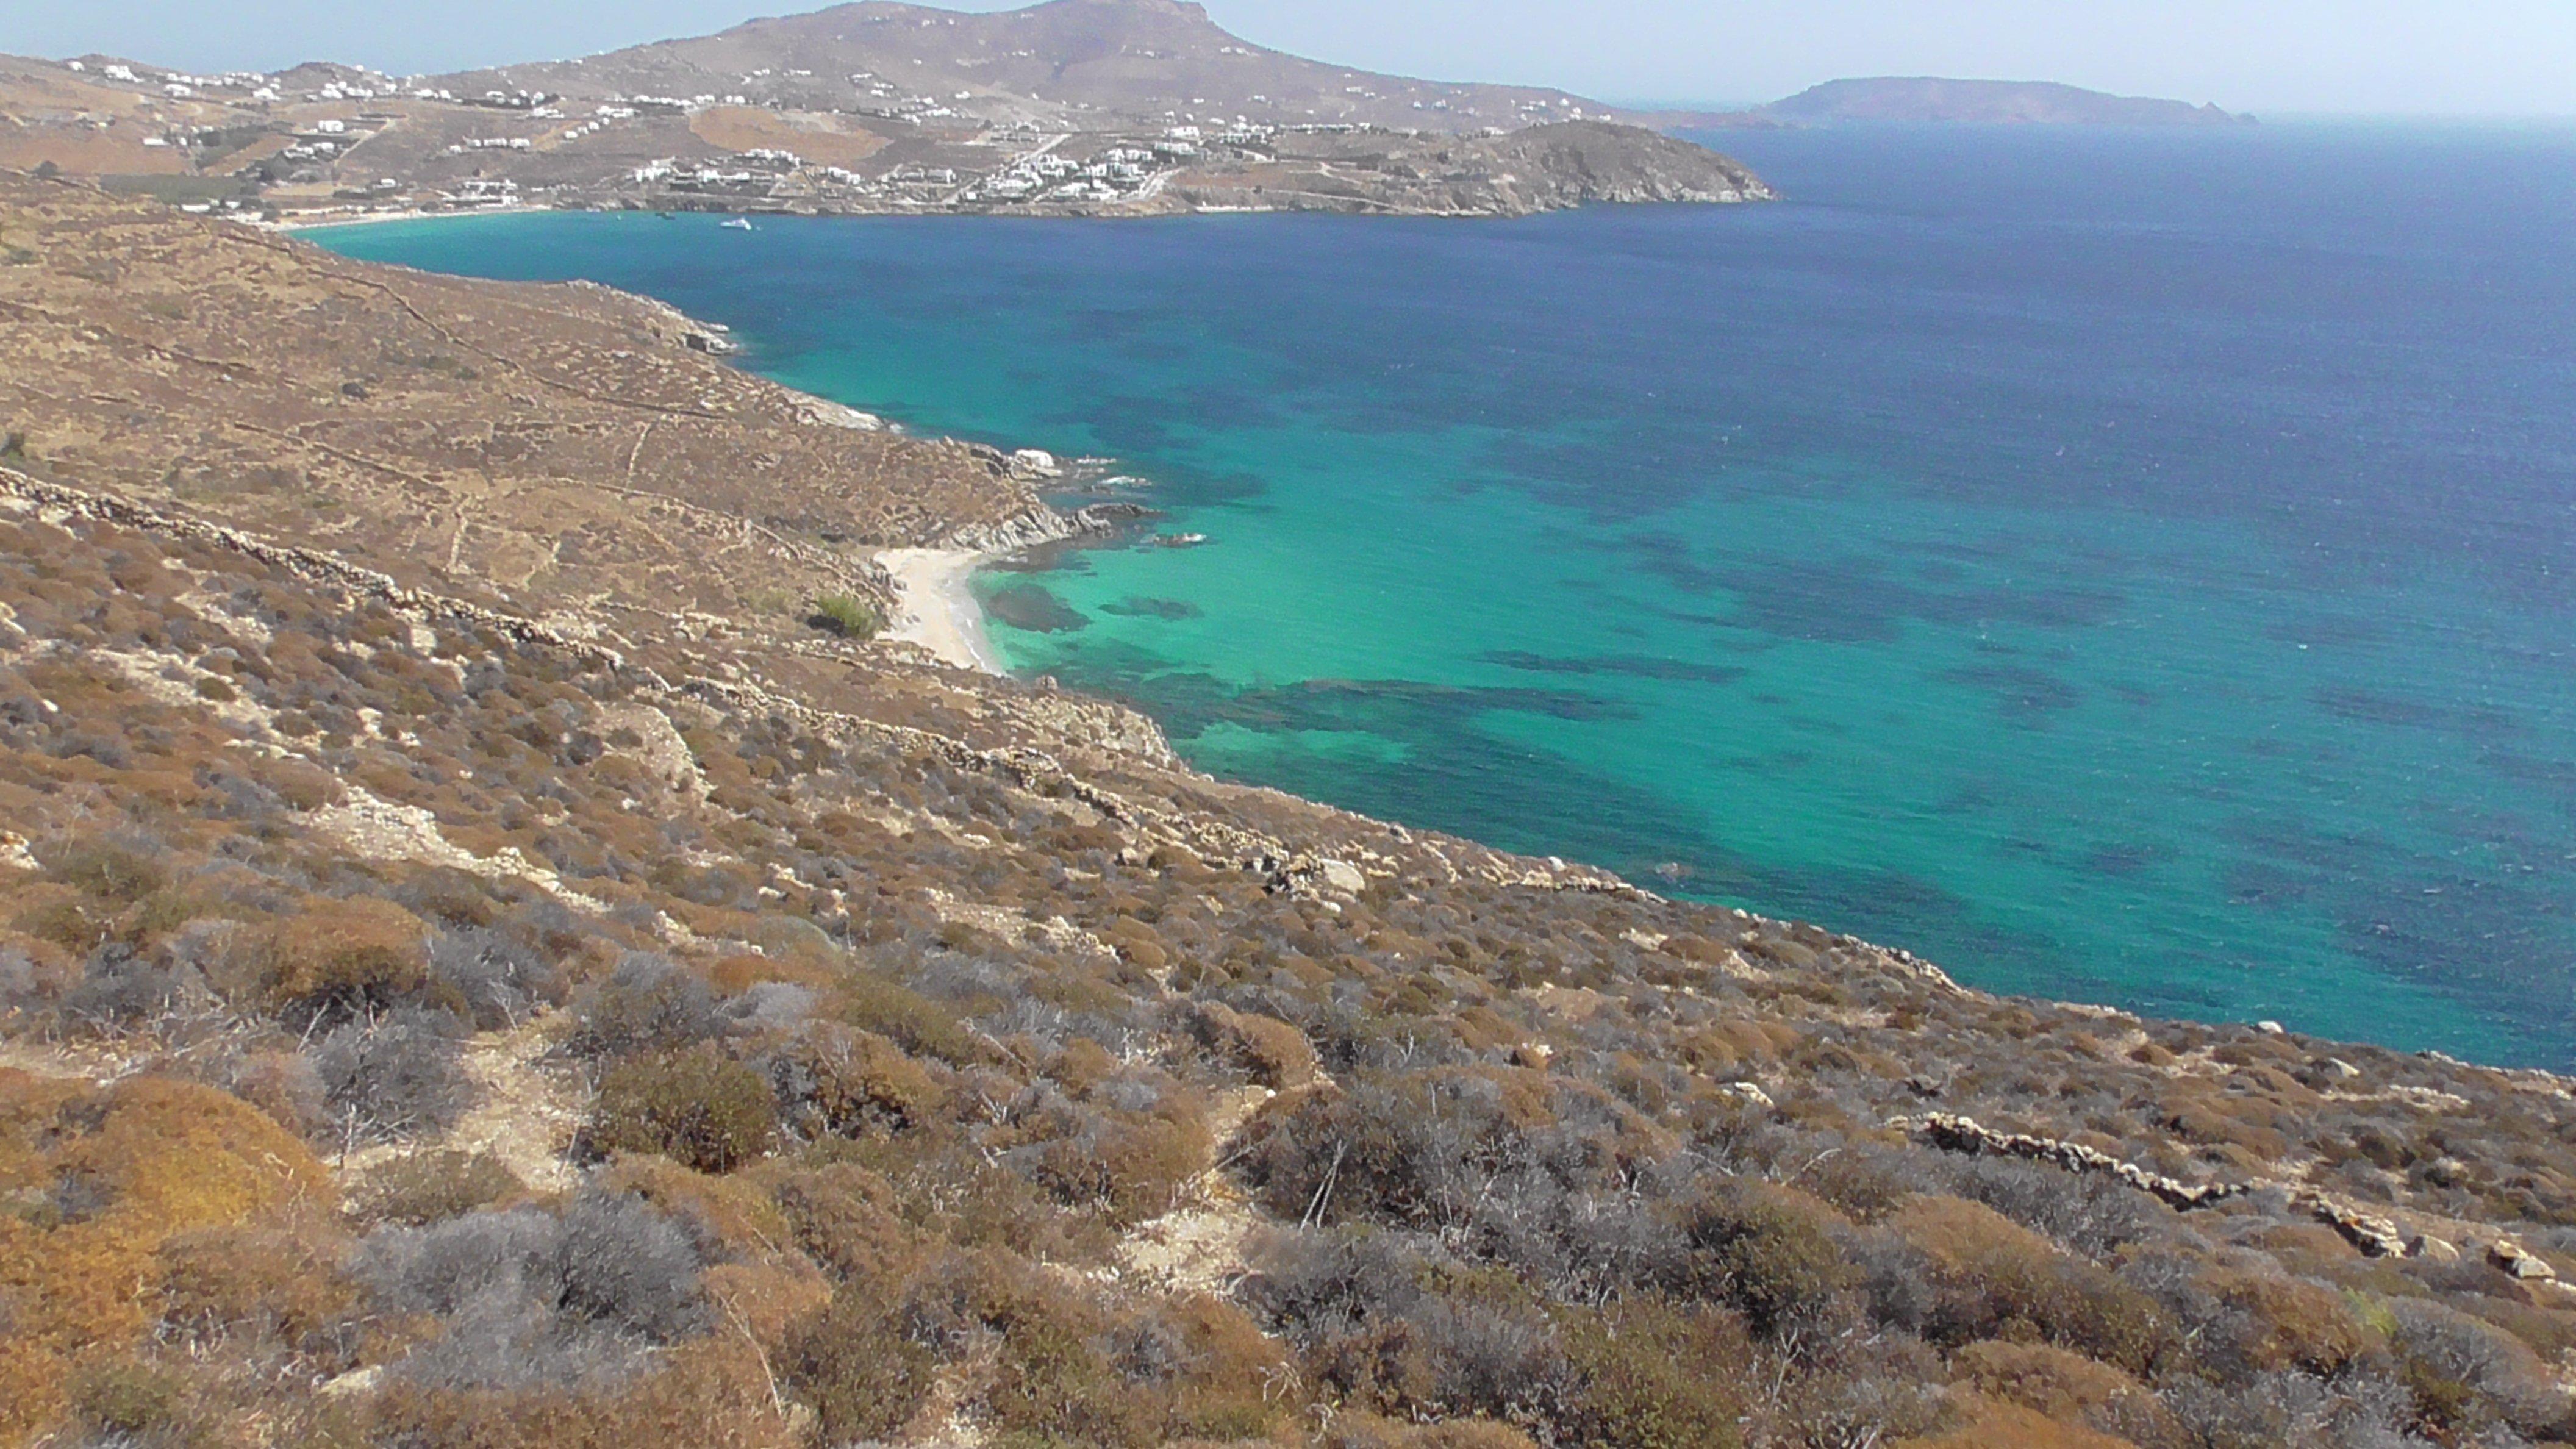 Terreno, Mykonos - Ref GR-5533-S